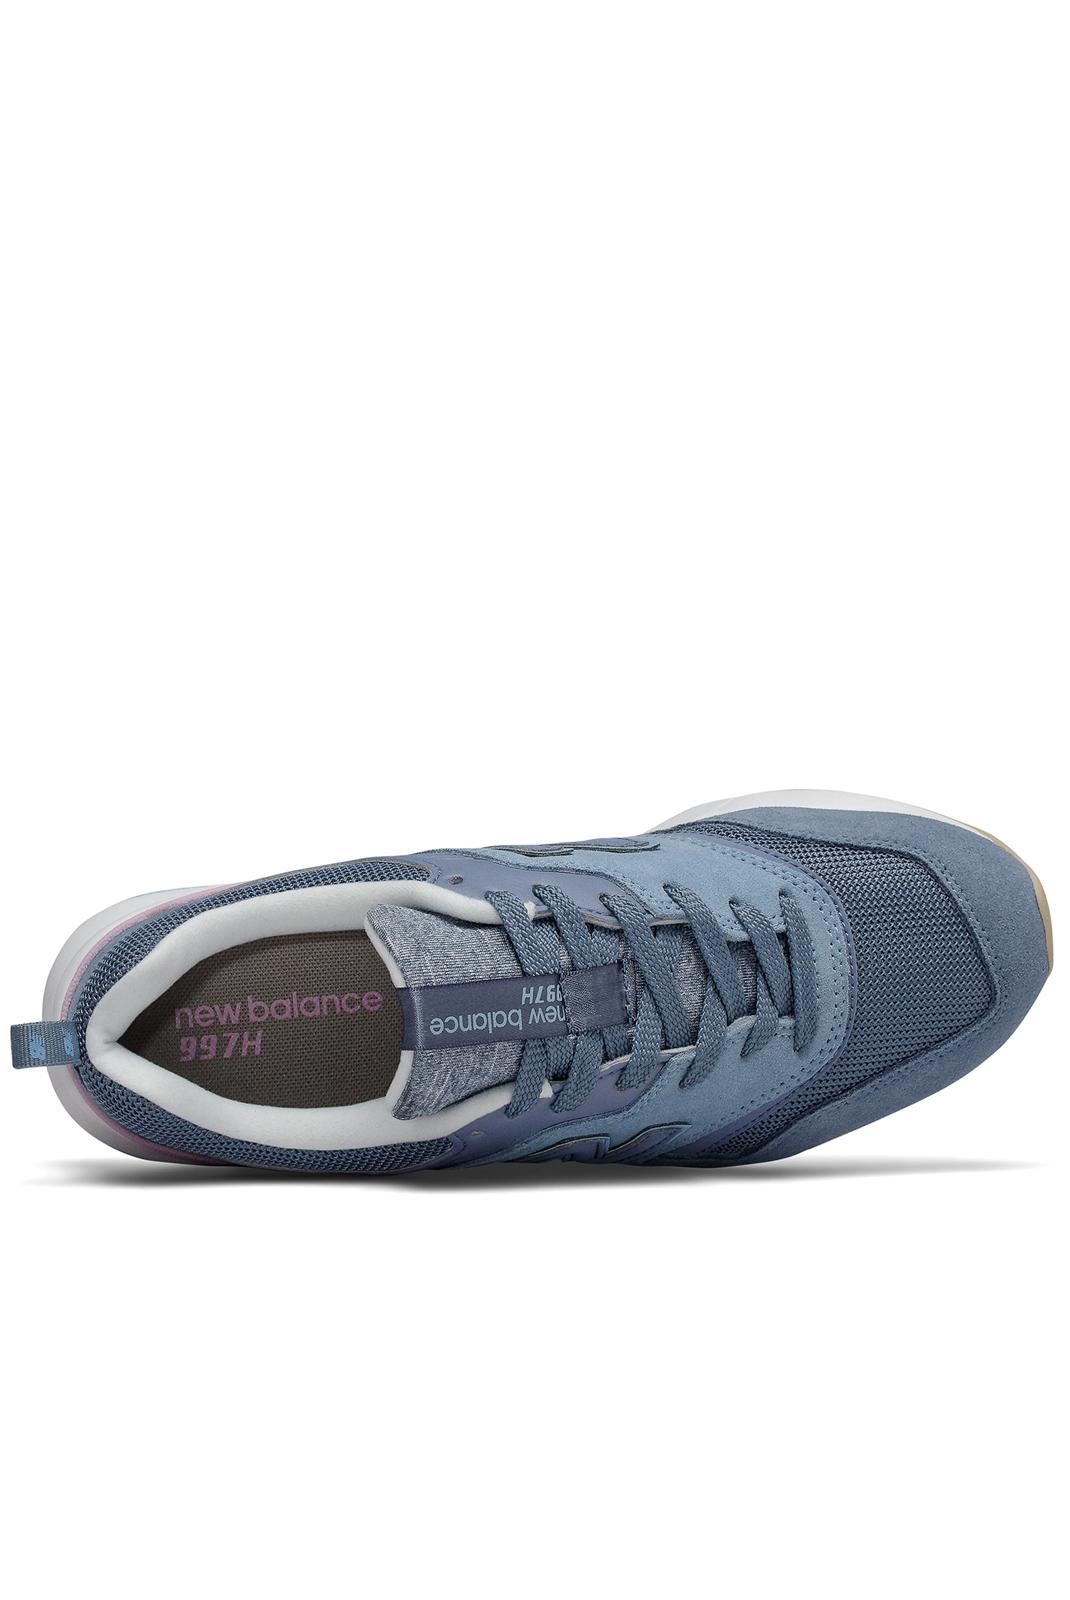 Baskets / Sneakers  New balance CW997HKD BLEU/ROSE